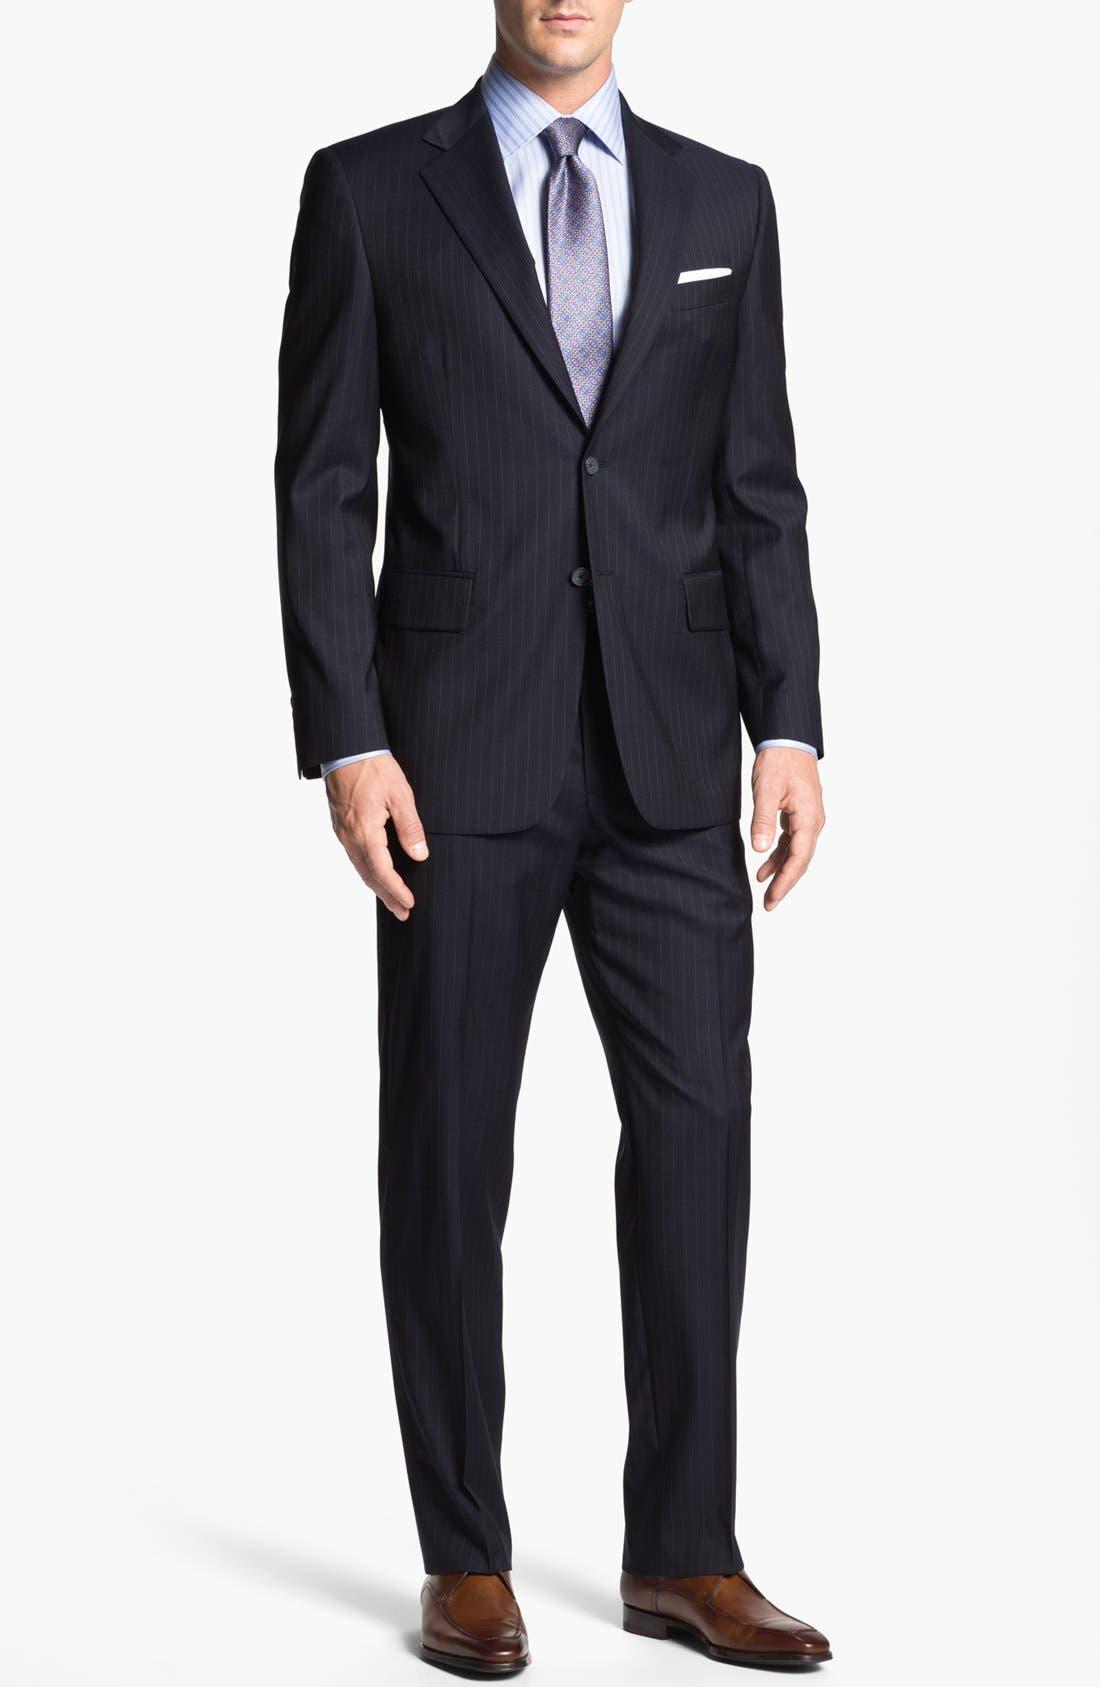 Alternate Image 1 Selected - Joseph Abboud 'Signature Silver' Stripe Wool Suit